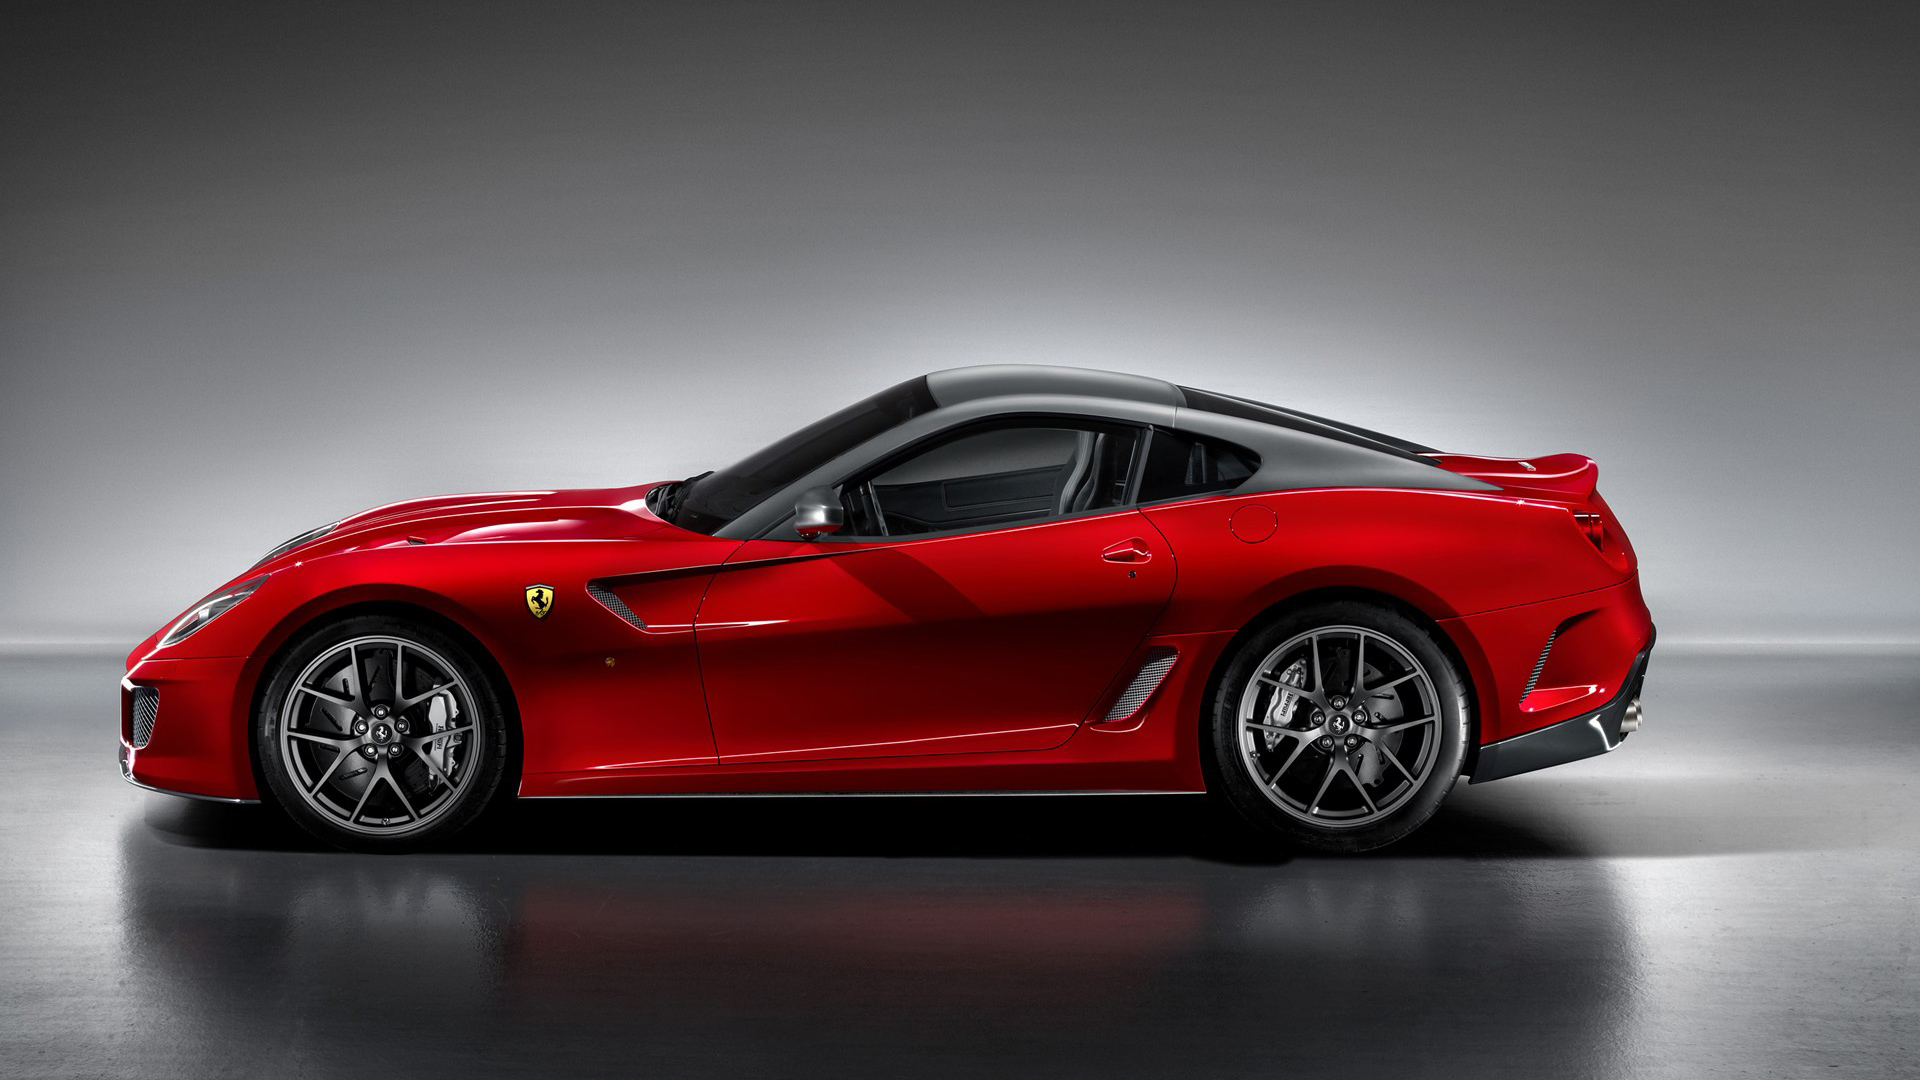 Ferrari 599 GTO 2011 Wallpapers HD Wallpapers 1920x1080